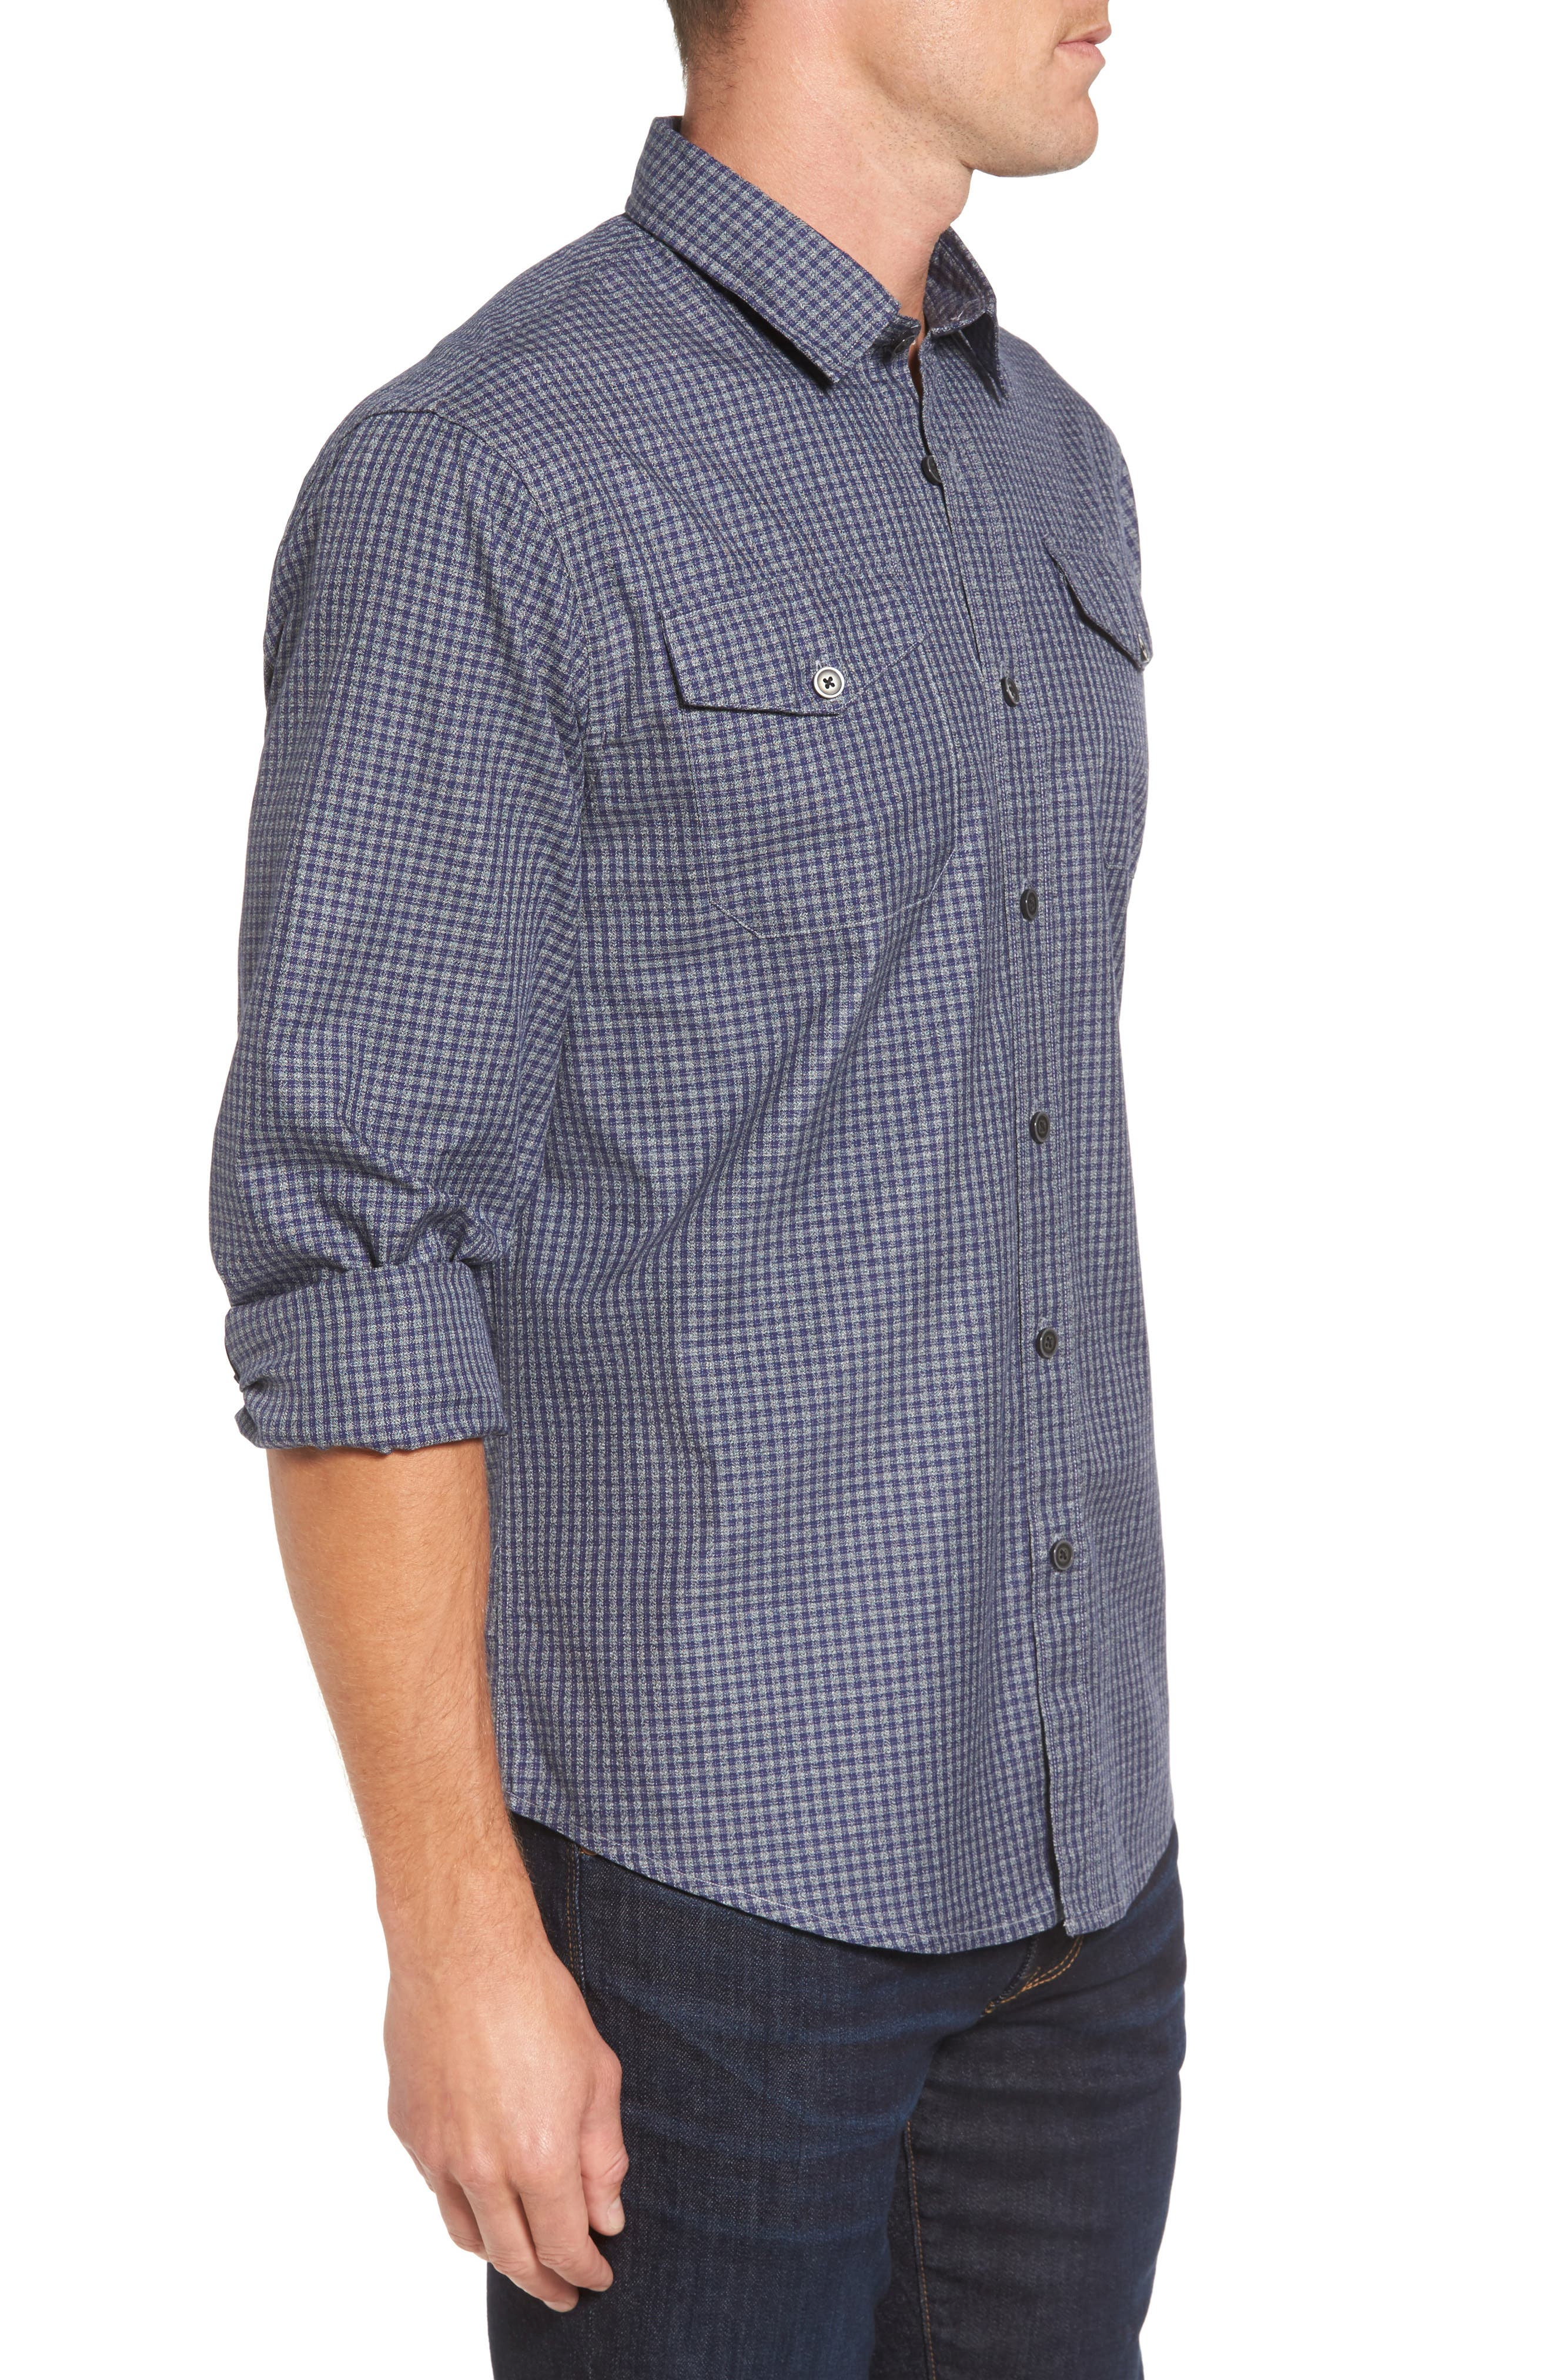 Main Street Check Flannel Shirt,                             Alternate thumbnail 3, color,                             405